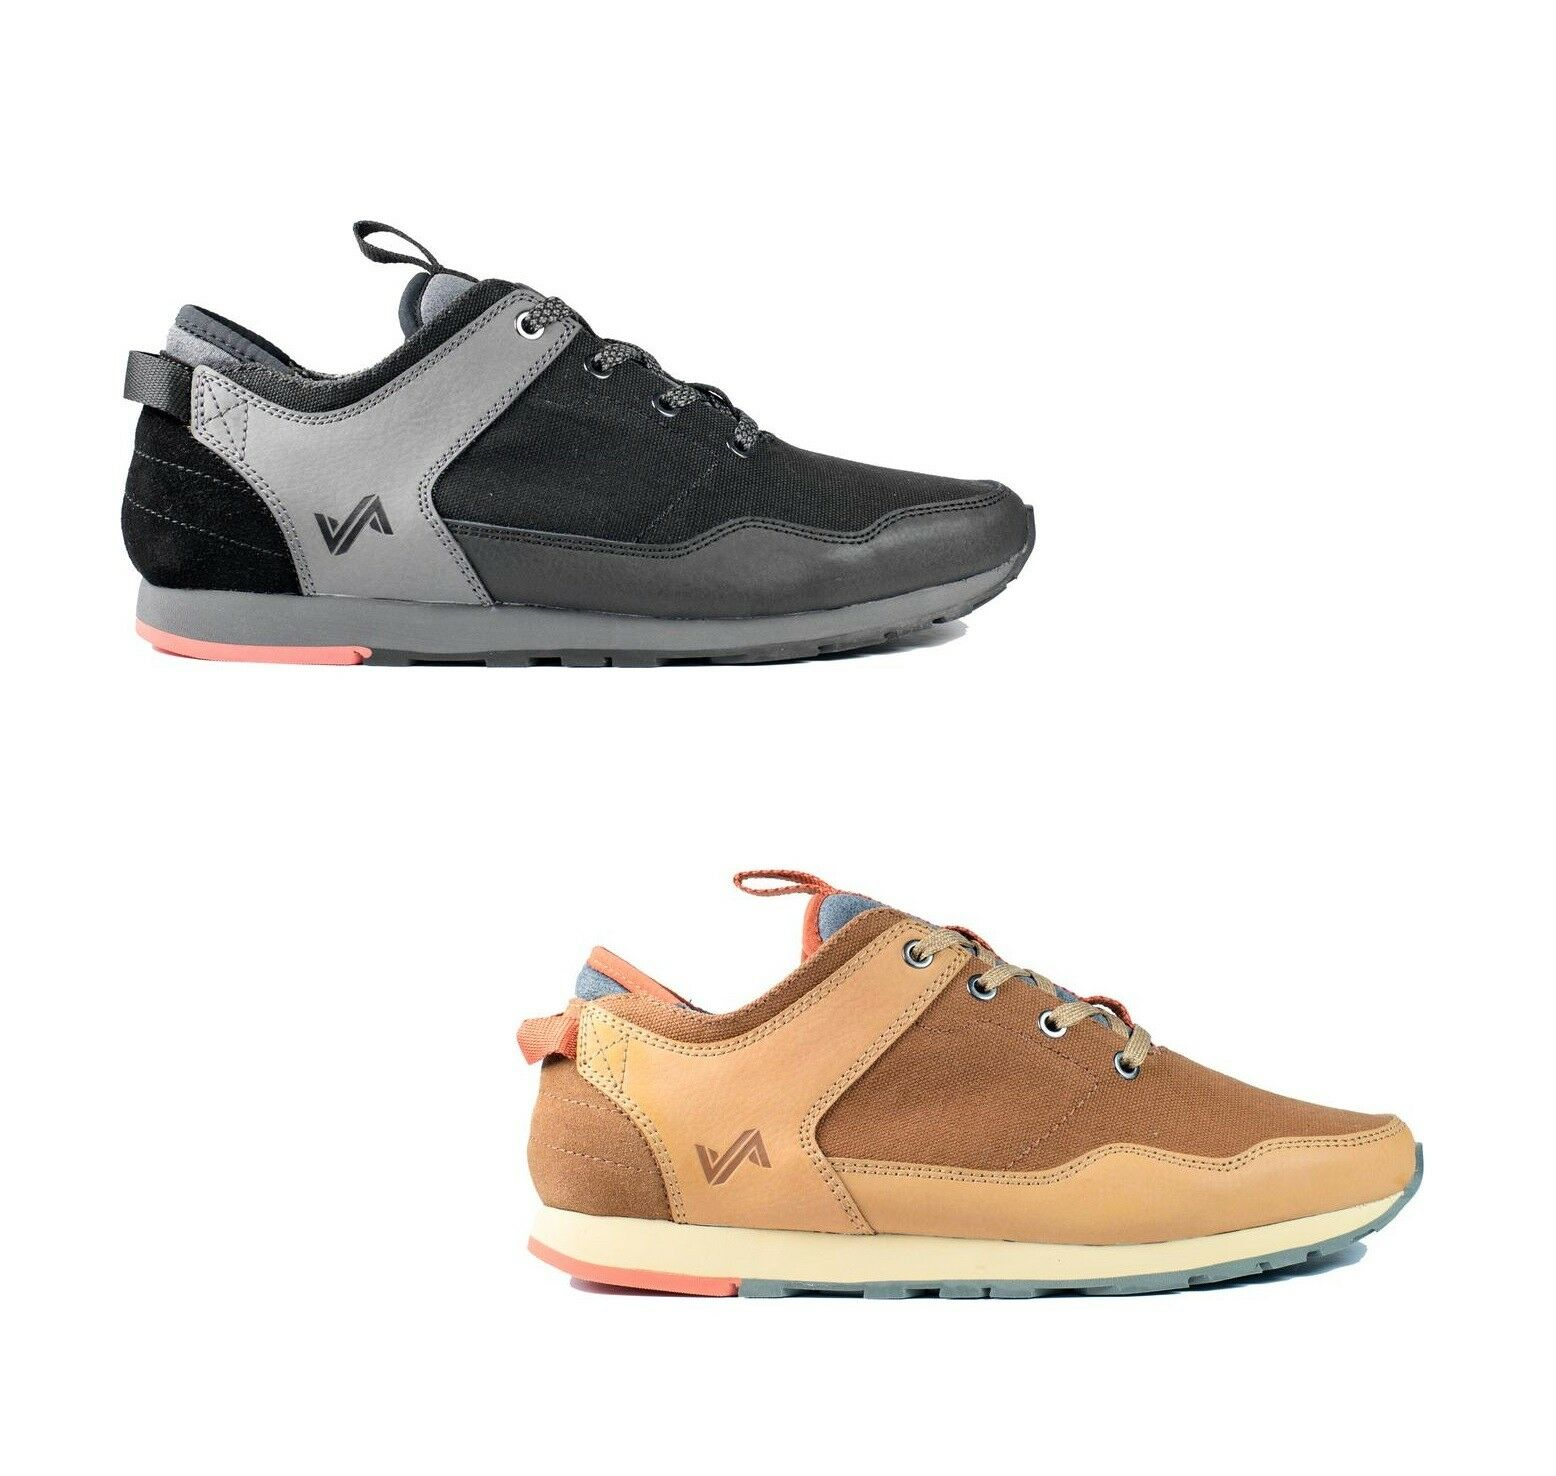 Forsake Lewis Men's shoes  Lightweight Travel Breathable EVA Hiking shoes